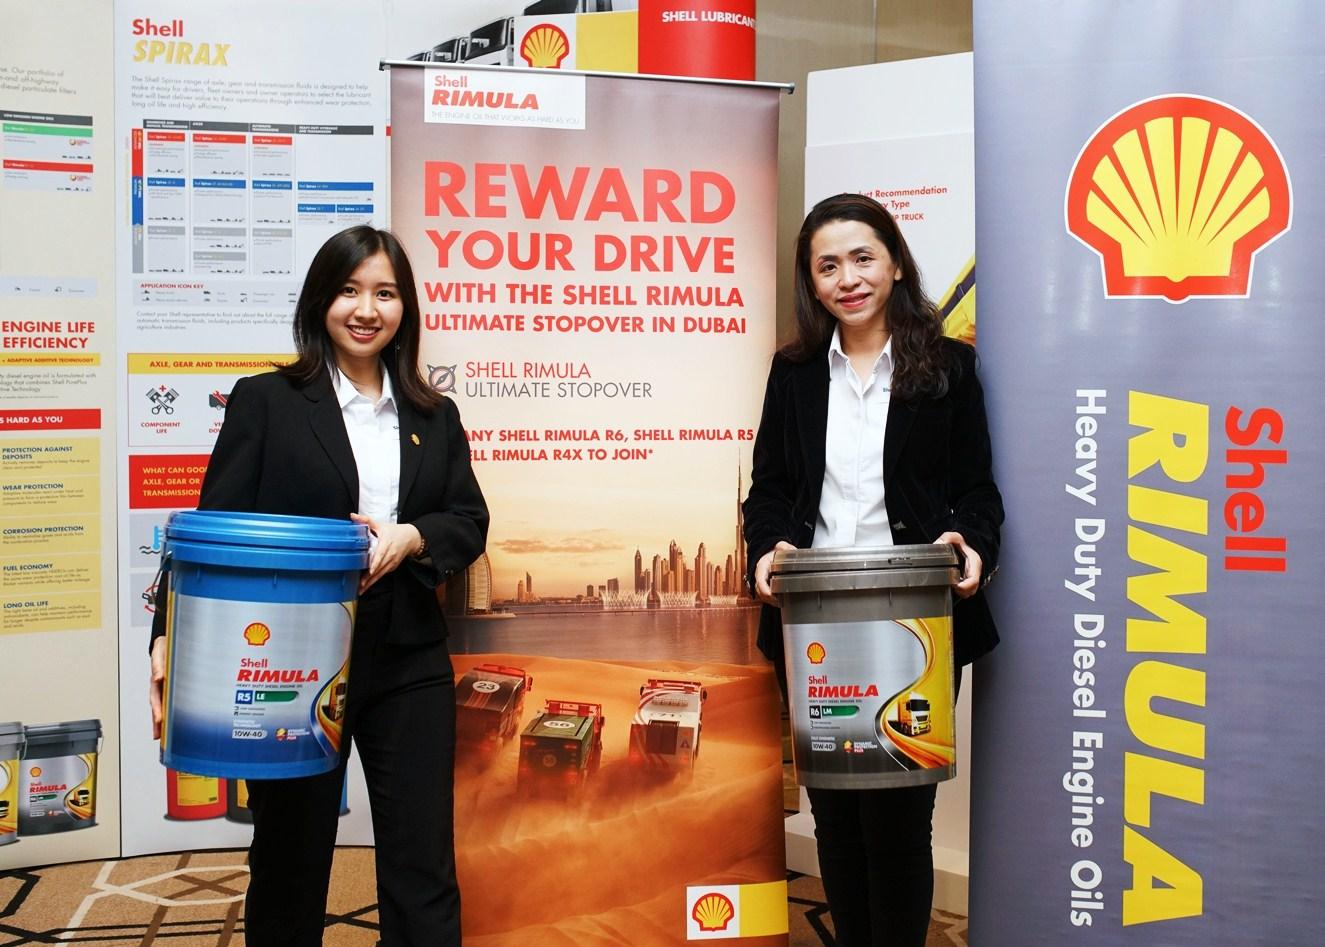 Amanda Shell motoring-malaysia: shell rimula contest - the shell rimula